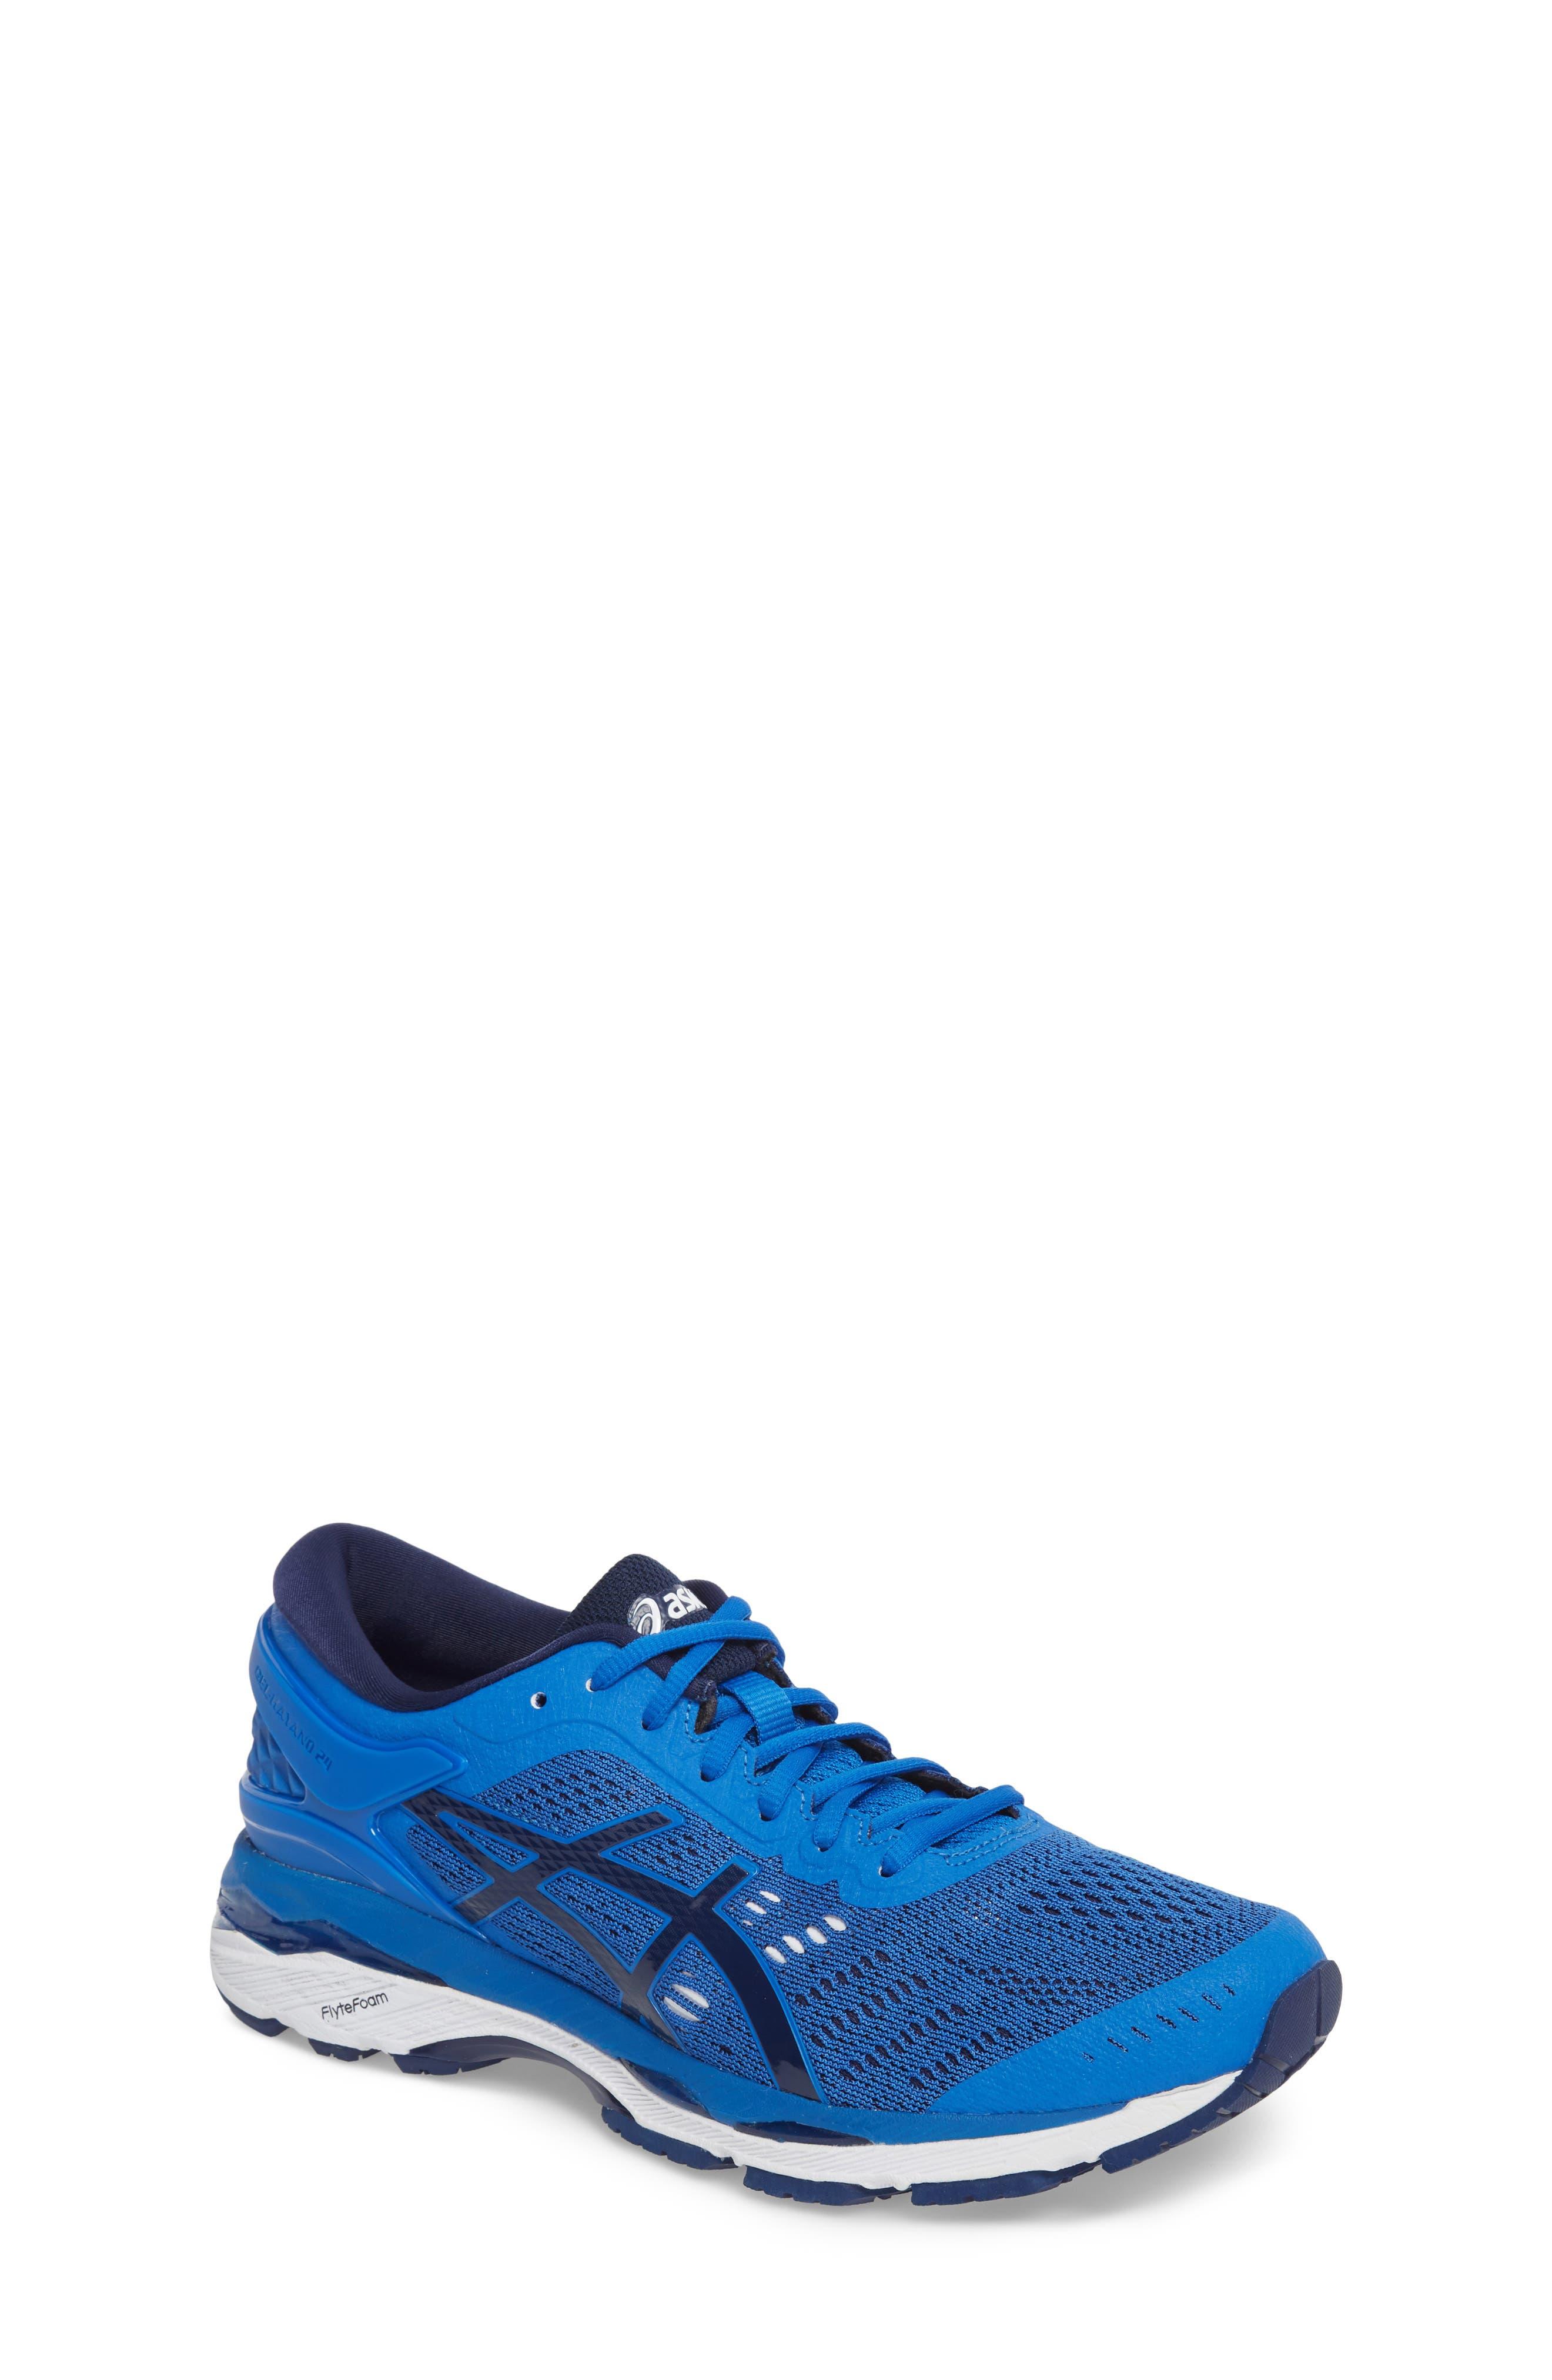 GEL-Kayano<sup>®</sup> 24 GS Running Shoe,                             Main thumbnail 1, color,